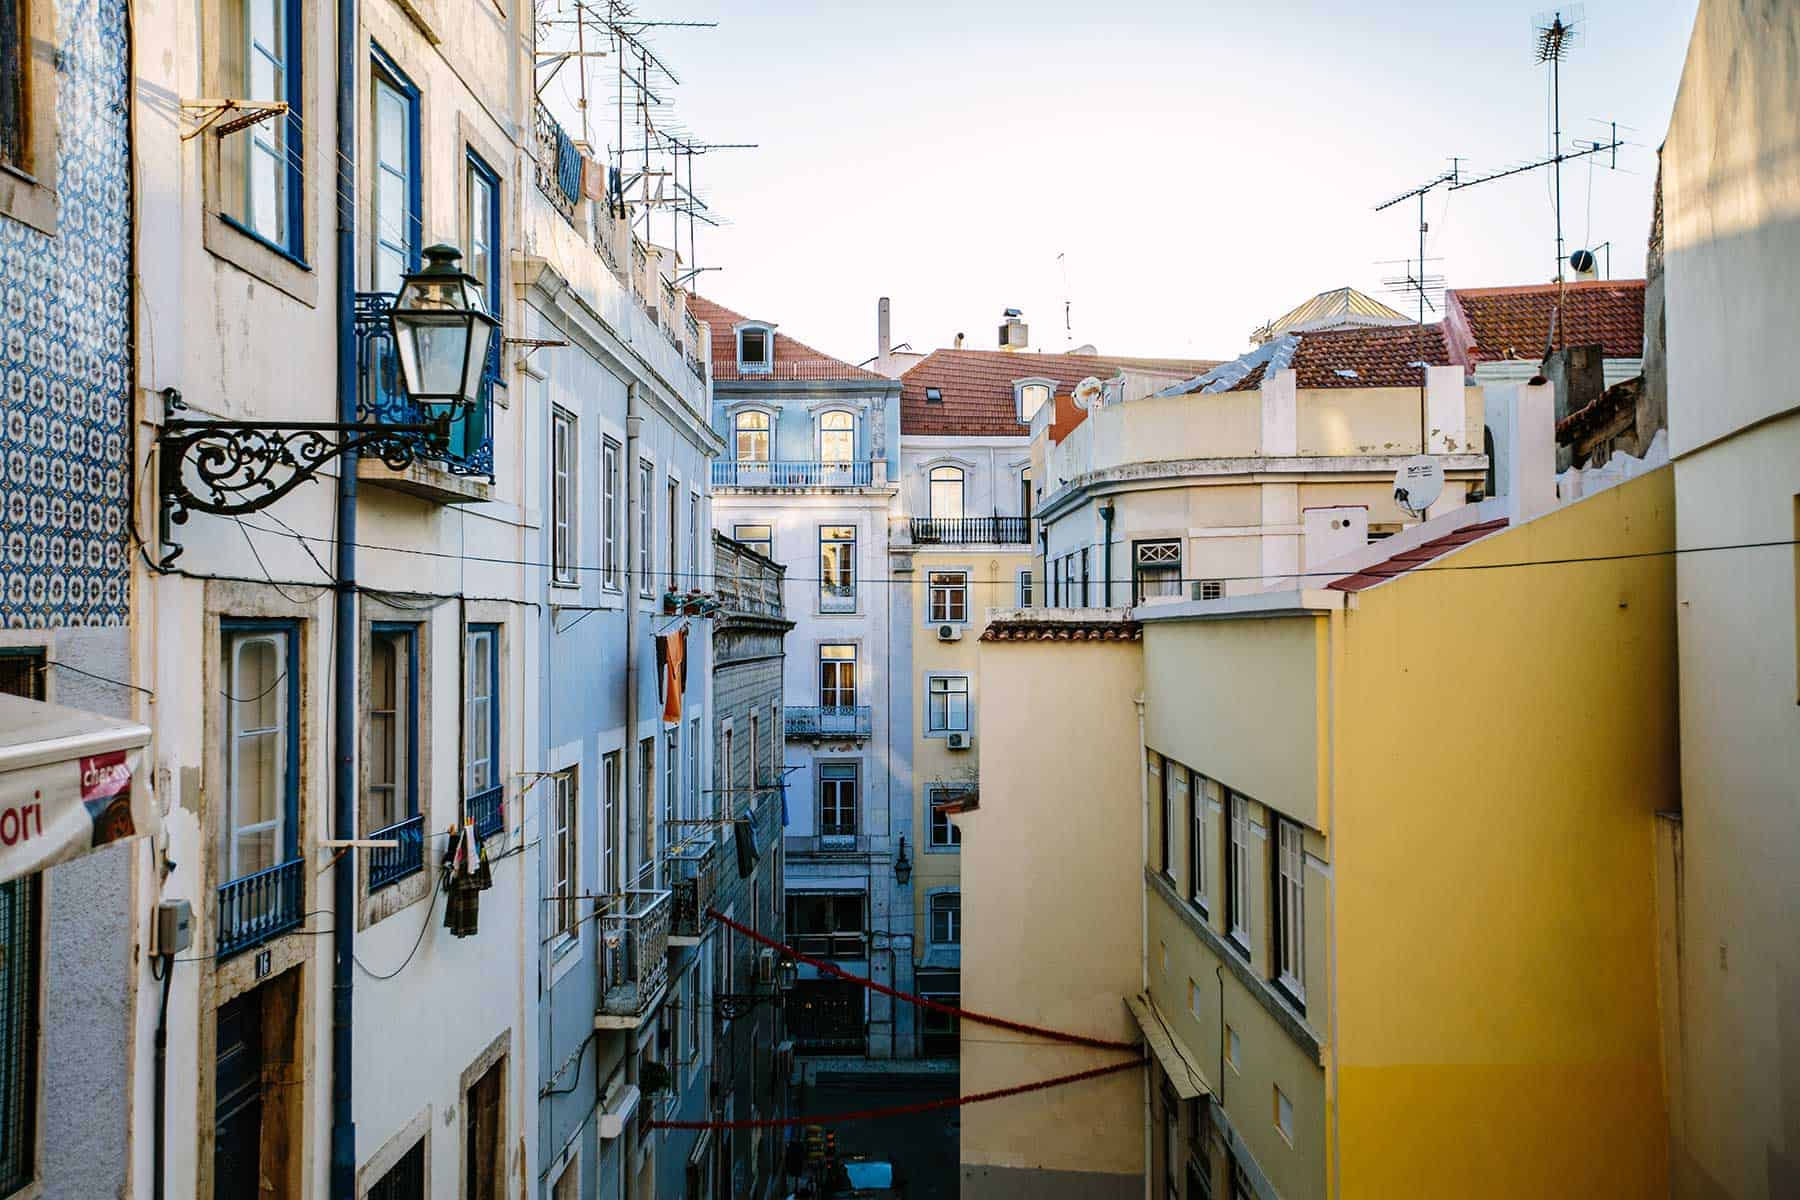 Resor_till_Lissabon_i_Portugal_hus_med_Nygren_Lind_Resebyrå